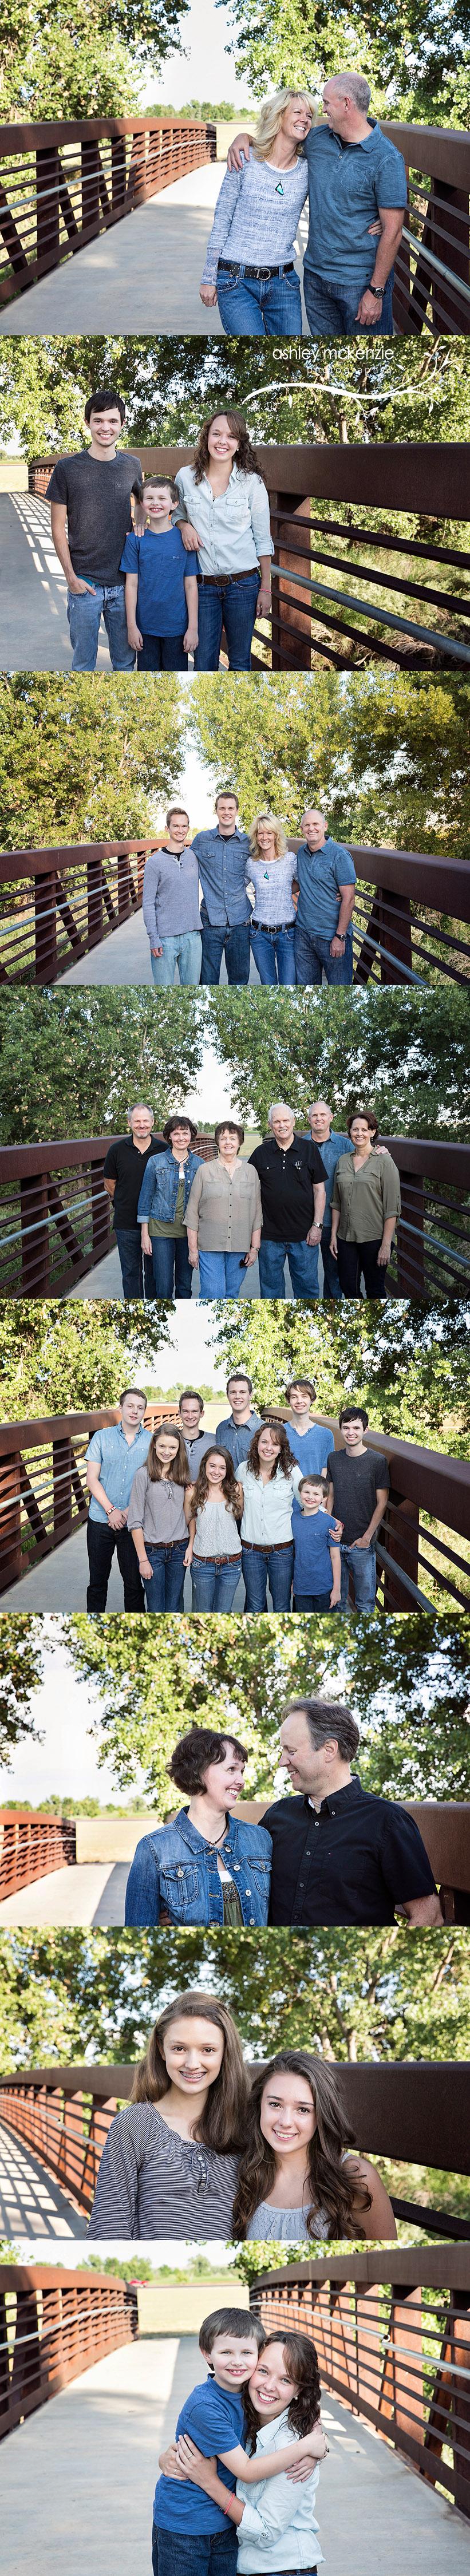 Family Photography byAshley McKenzie Photography in Windsor, Colorado